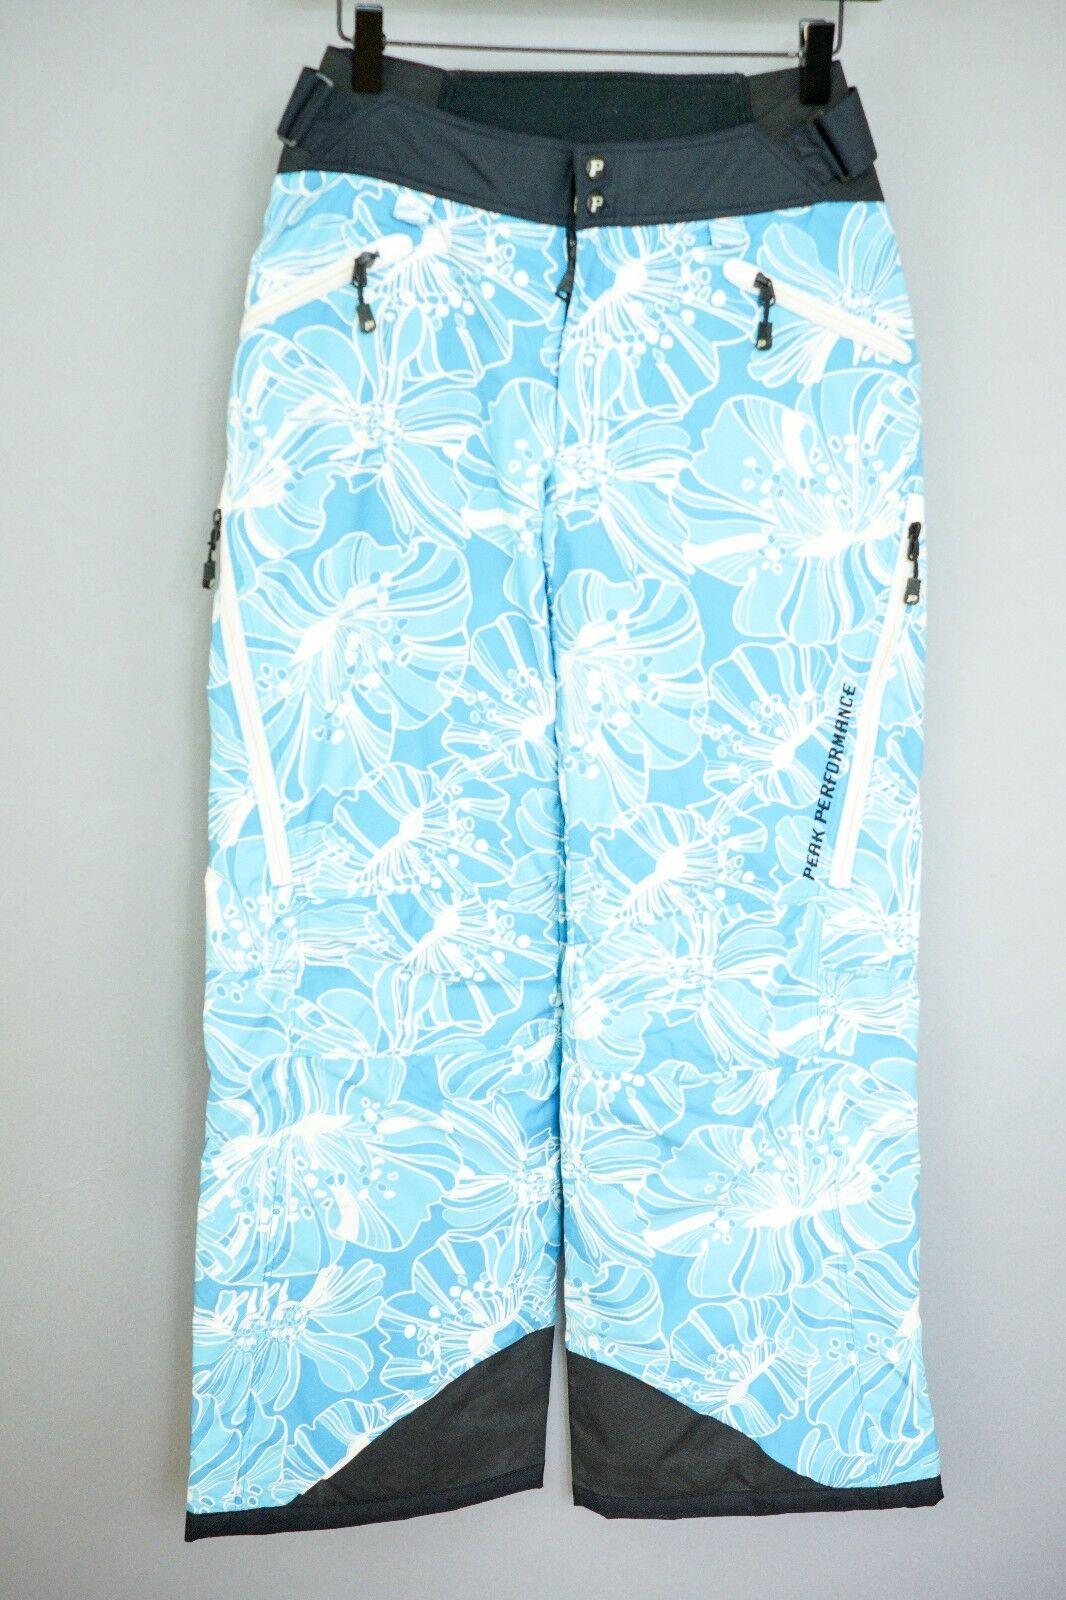 XII400 Women Peak Performance  Hipe Fleur SkiingSnowboarding Trousers XS W28 L30  discount promotions